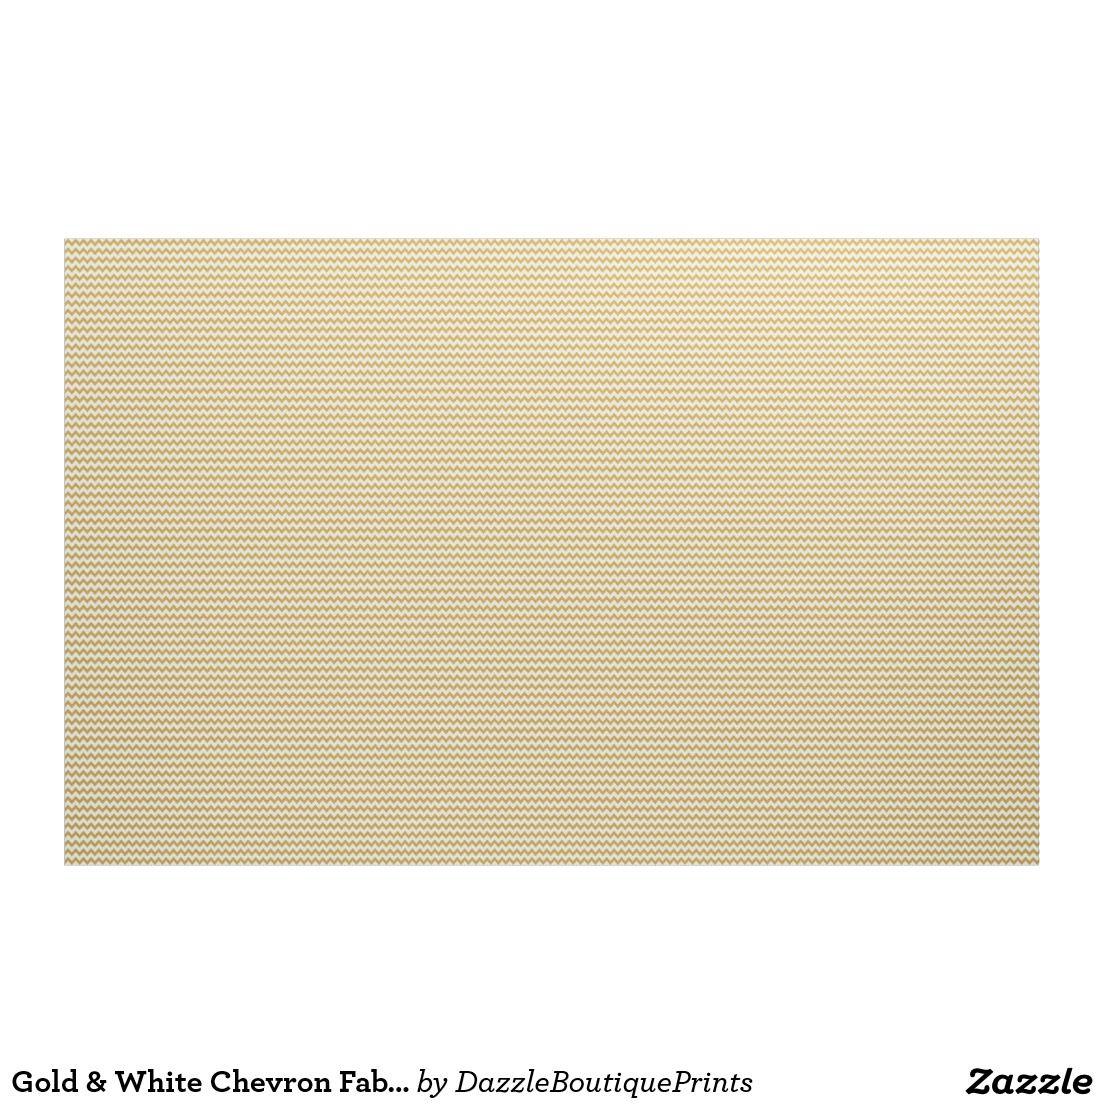 Gold & White Chevron Fabric | Chevron fabric, Fabrics and Patterns